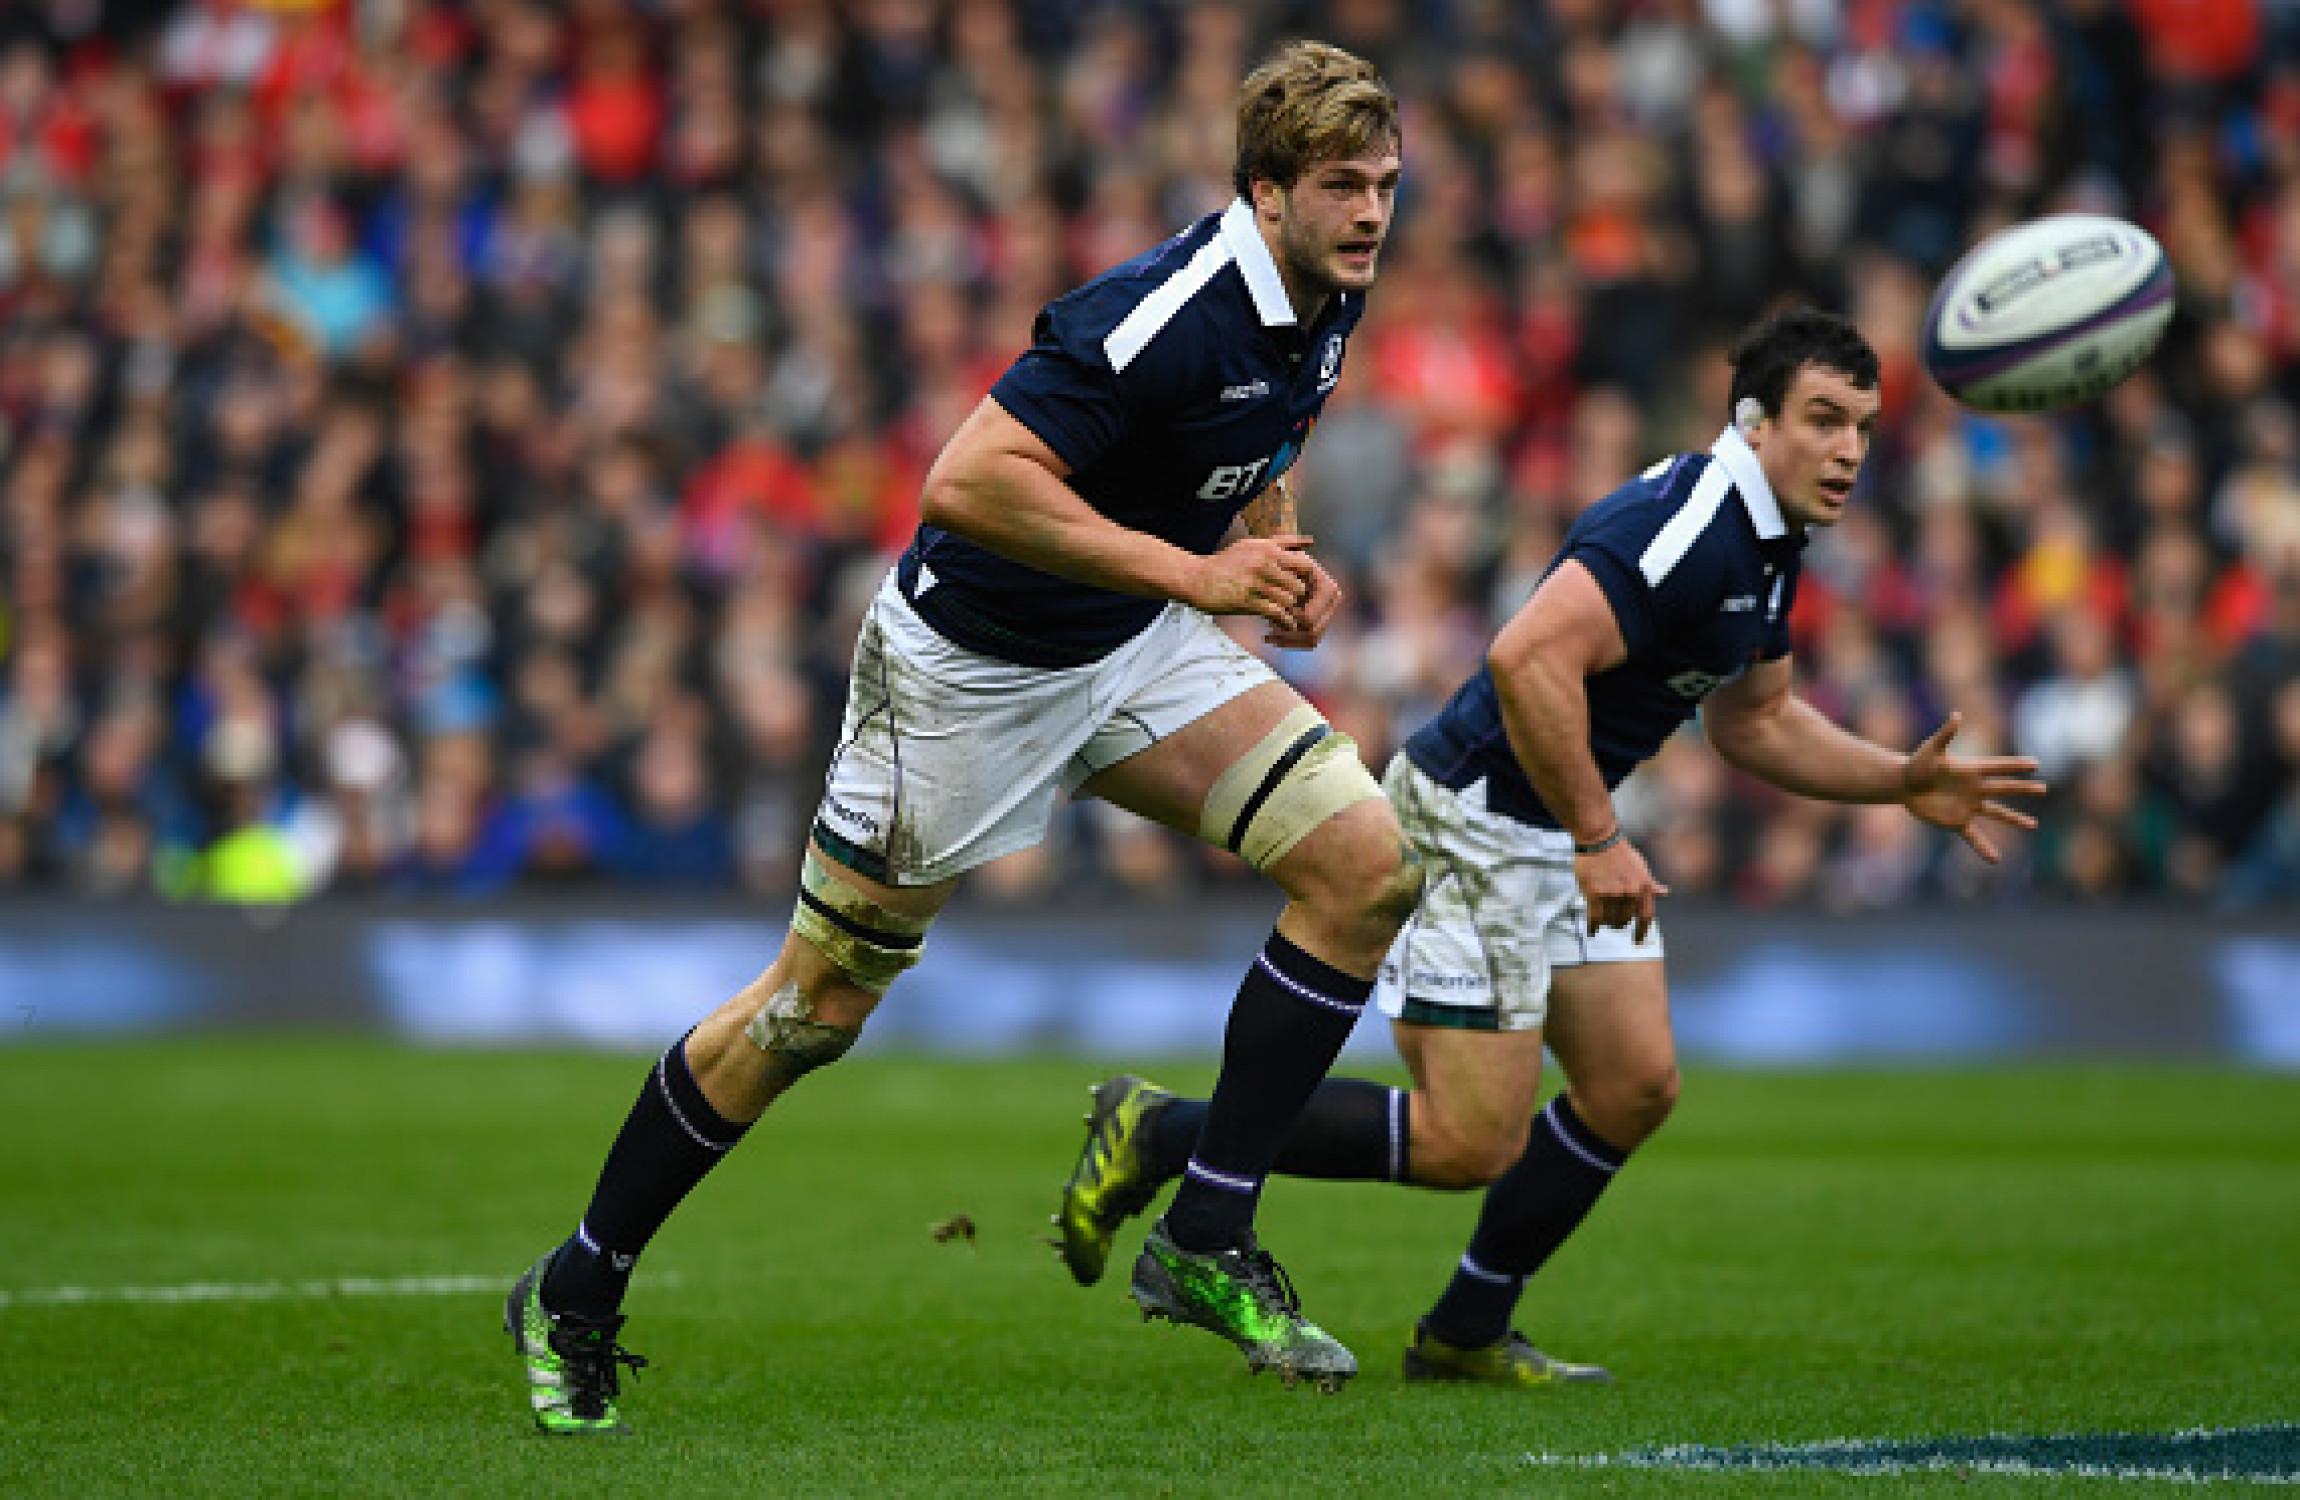 Richie Gray, John Hardie return to Scotland Six Nations squad